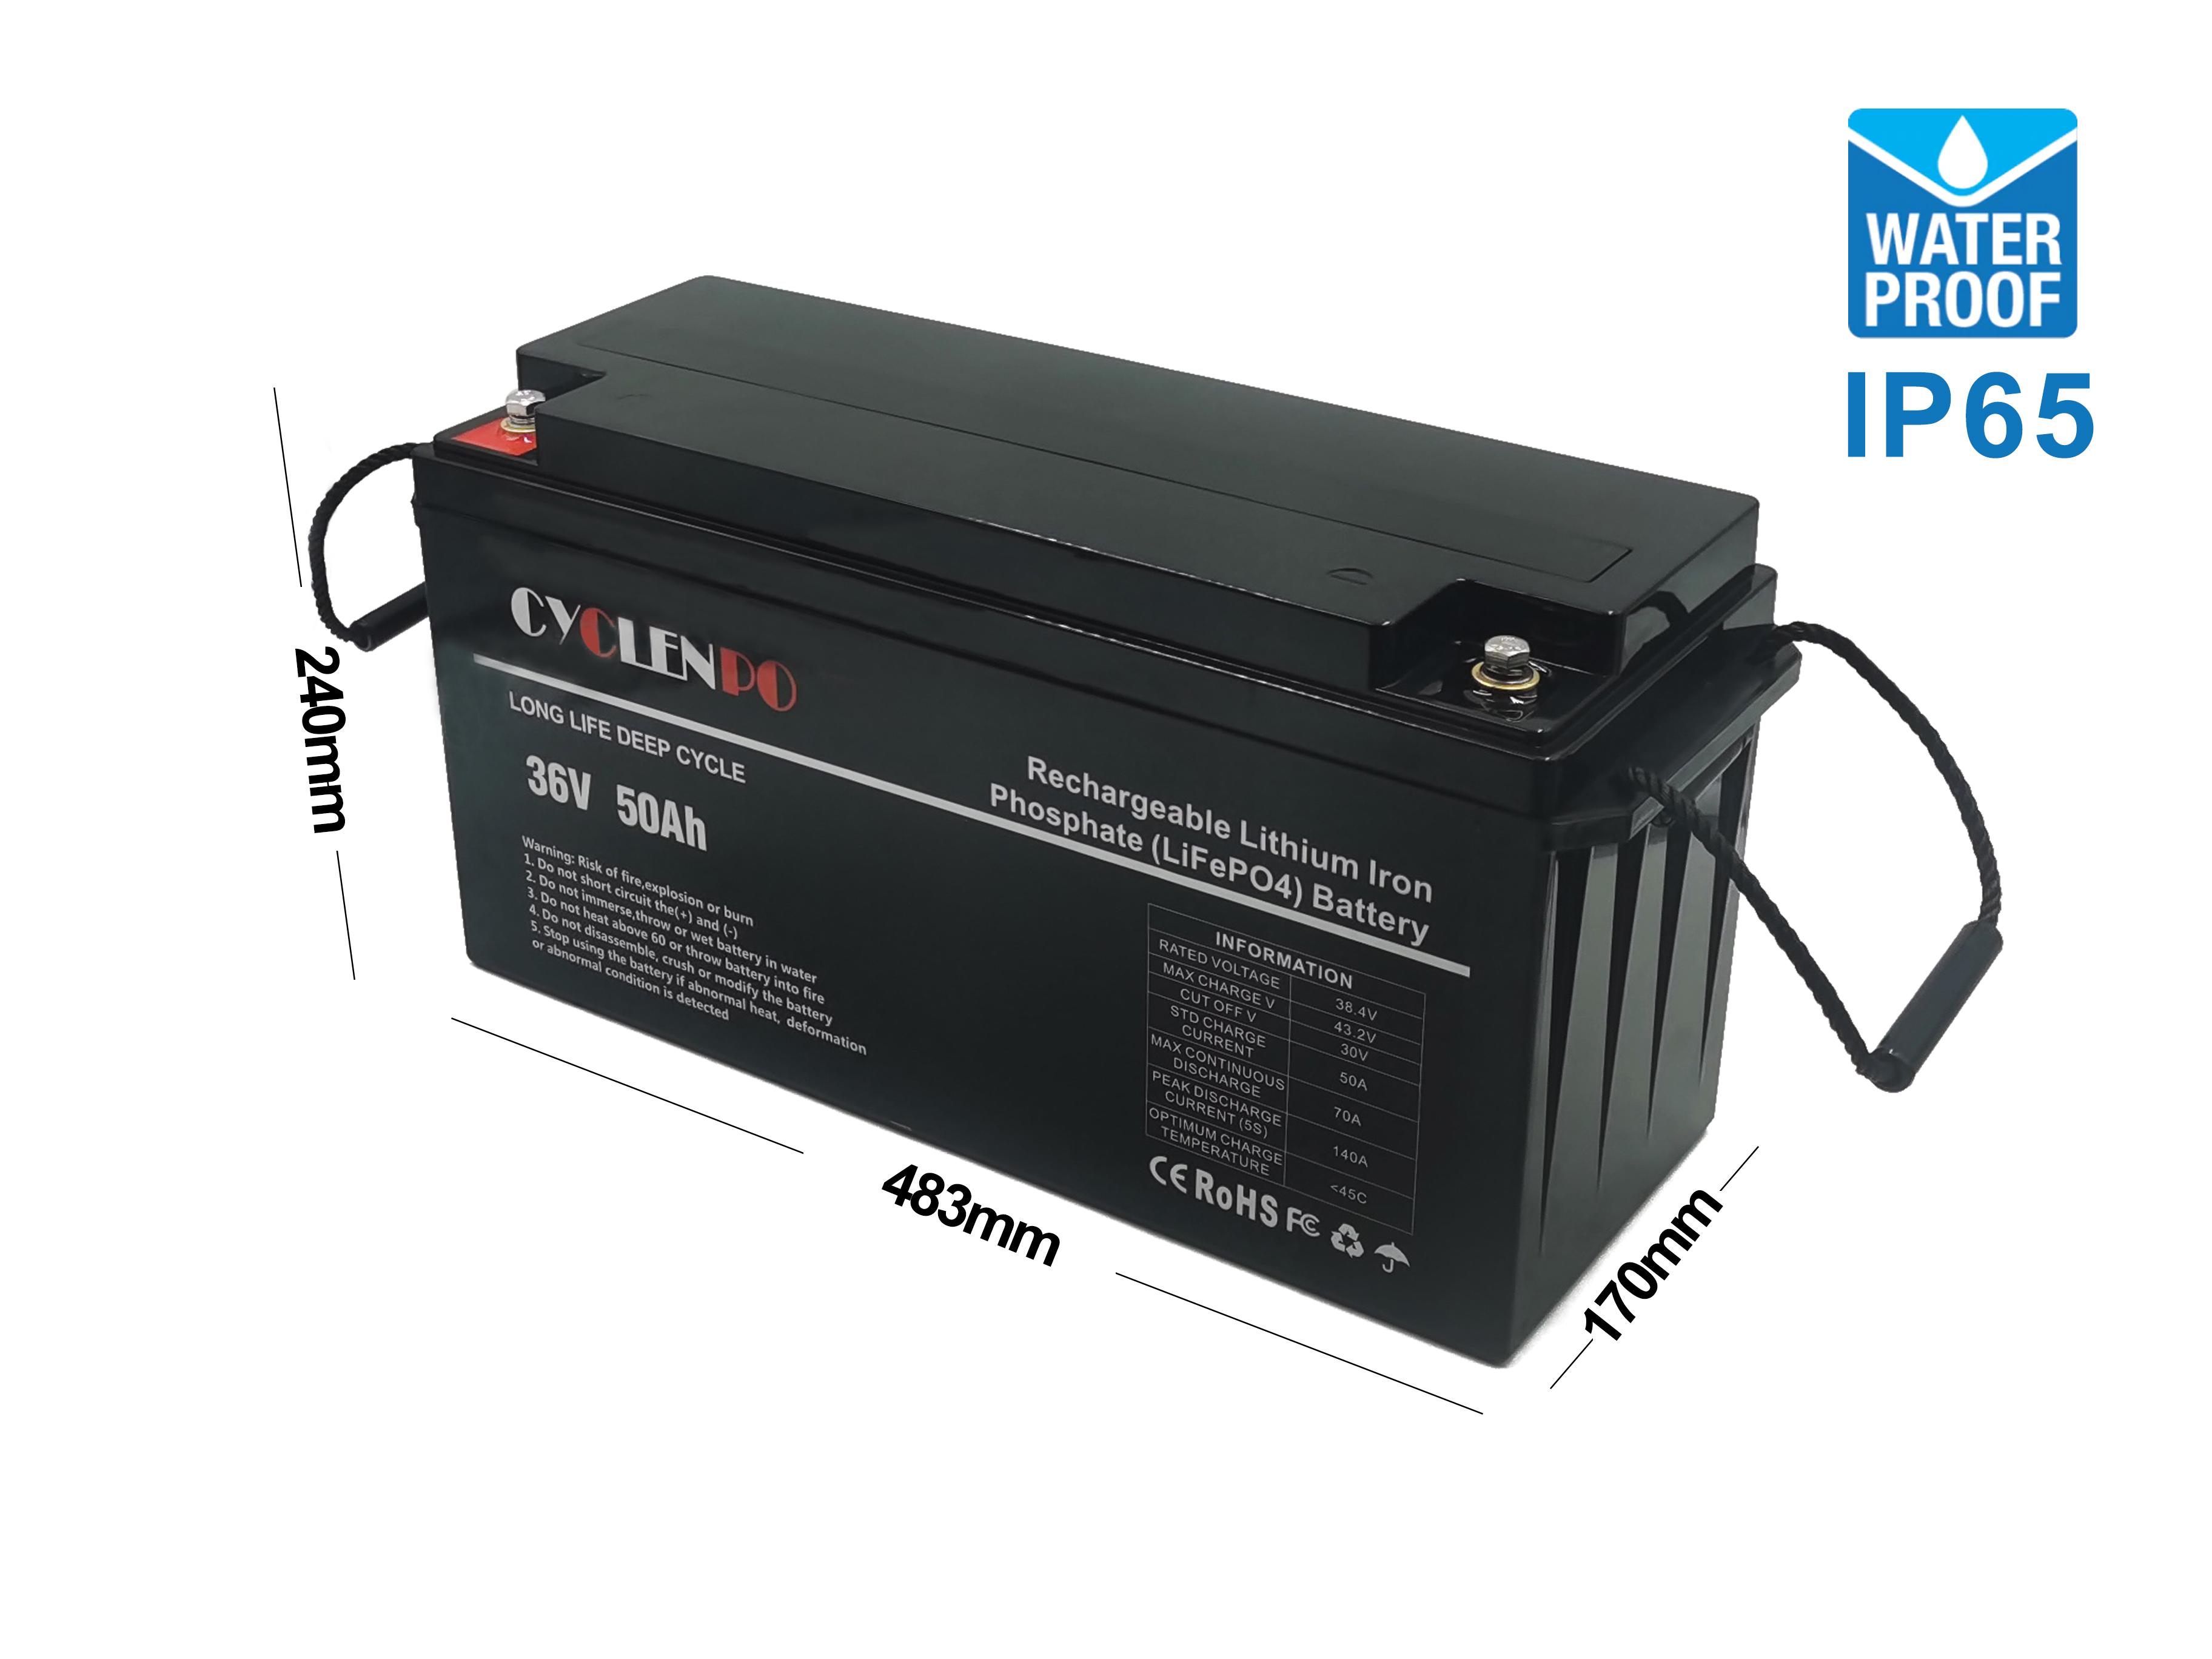 36v 50ah lithium battery